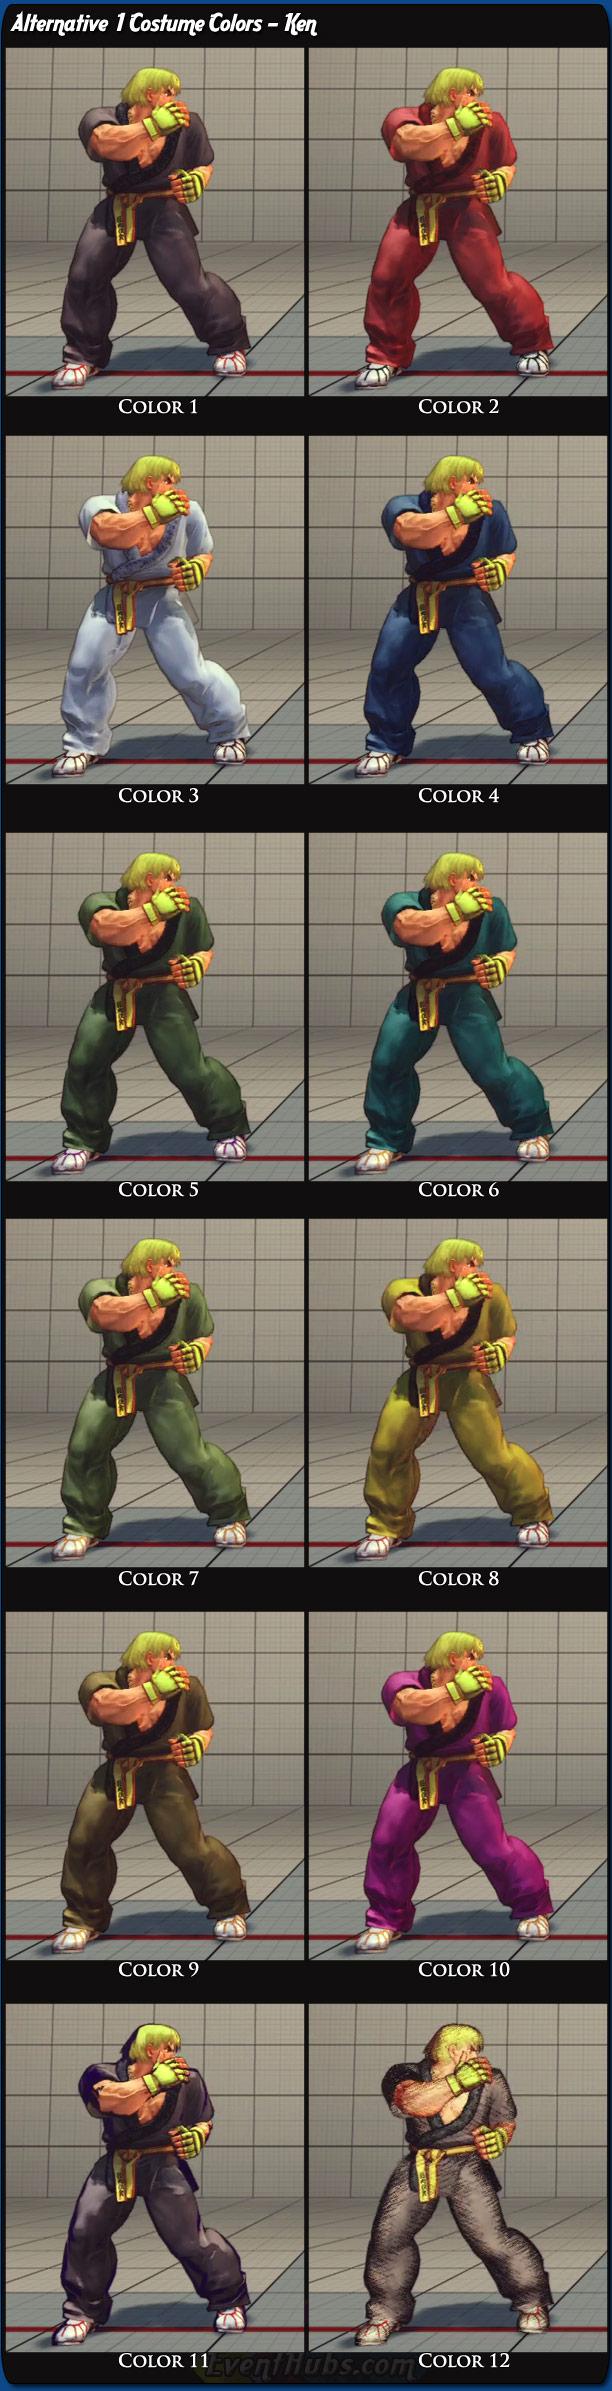 Ken's alternative costume colors for Super Street Fighter 4